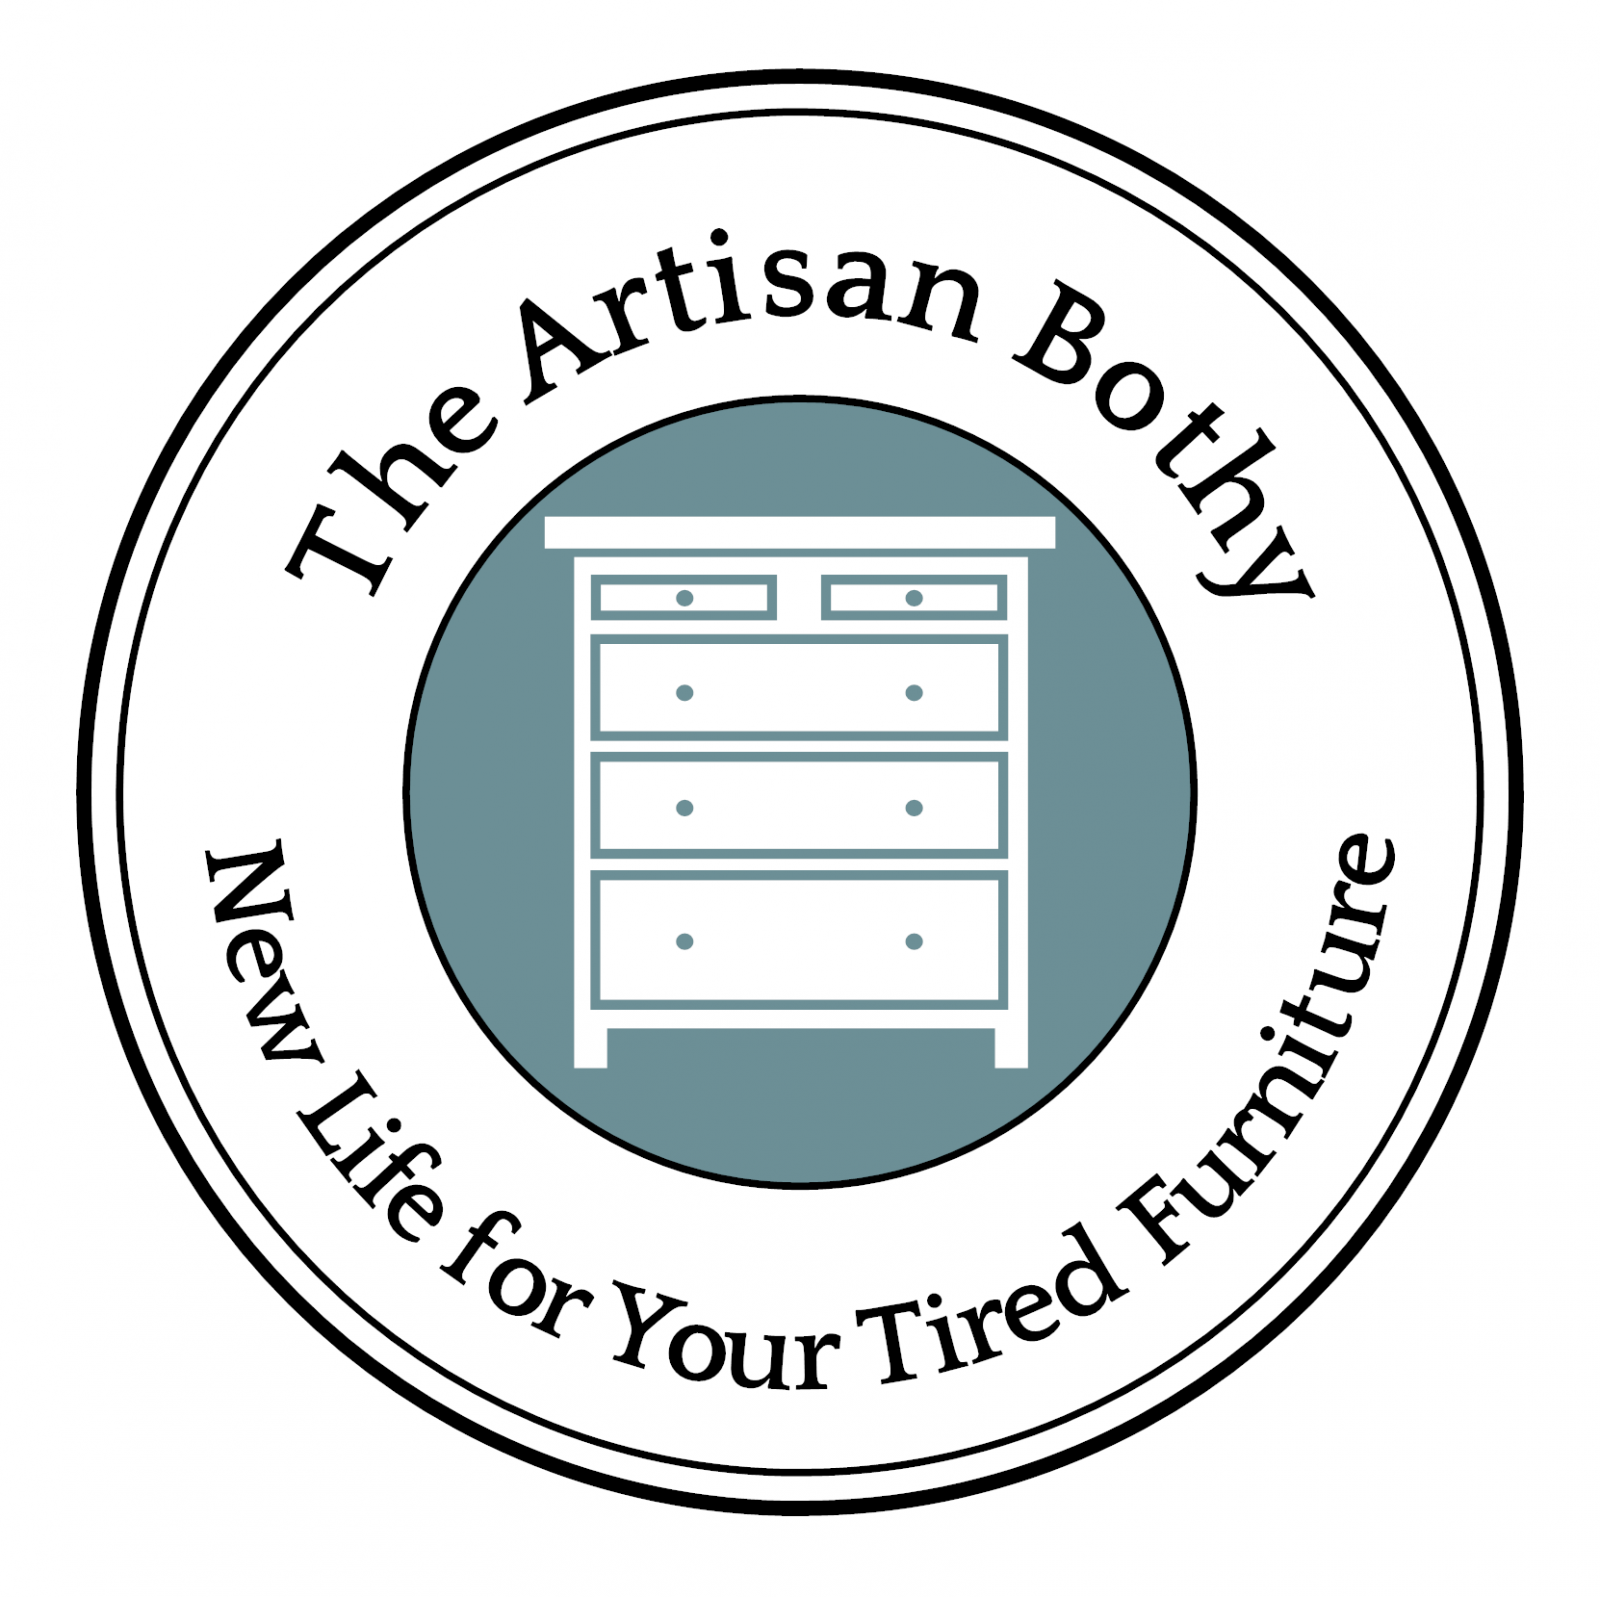 The Artisan Bothy